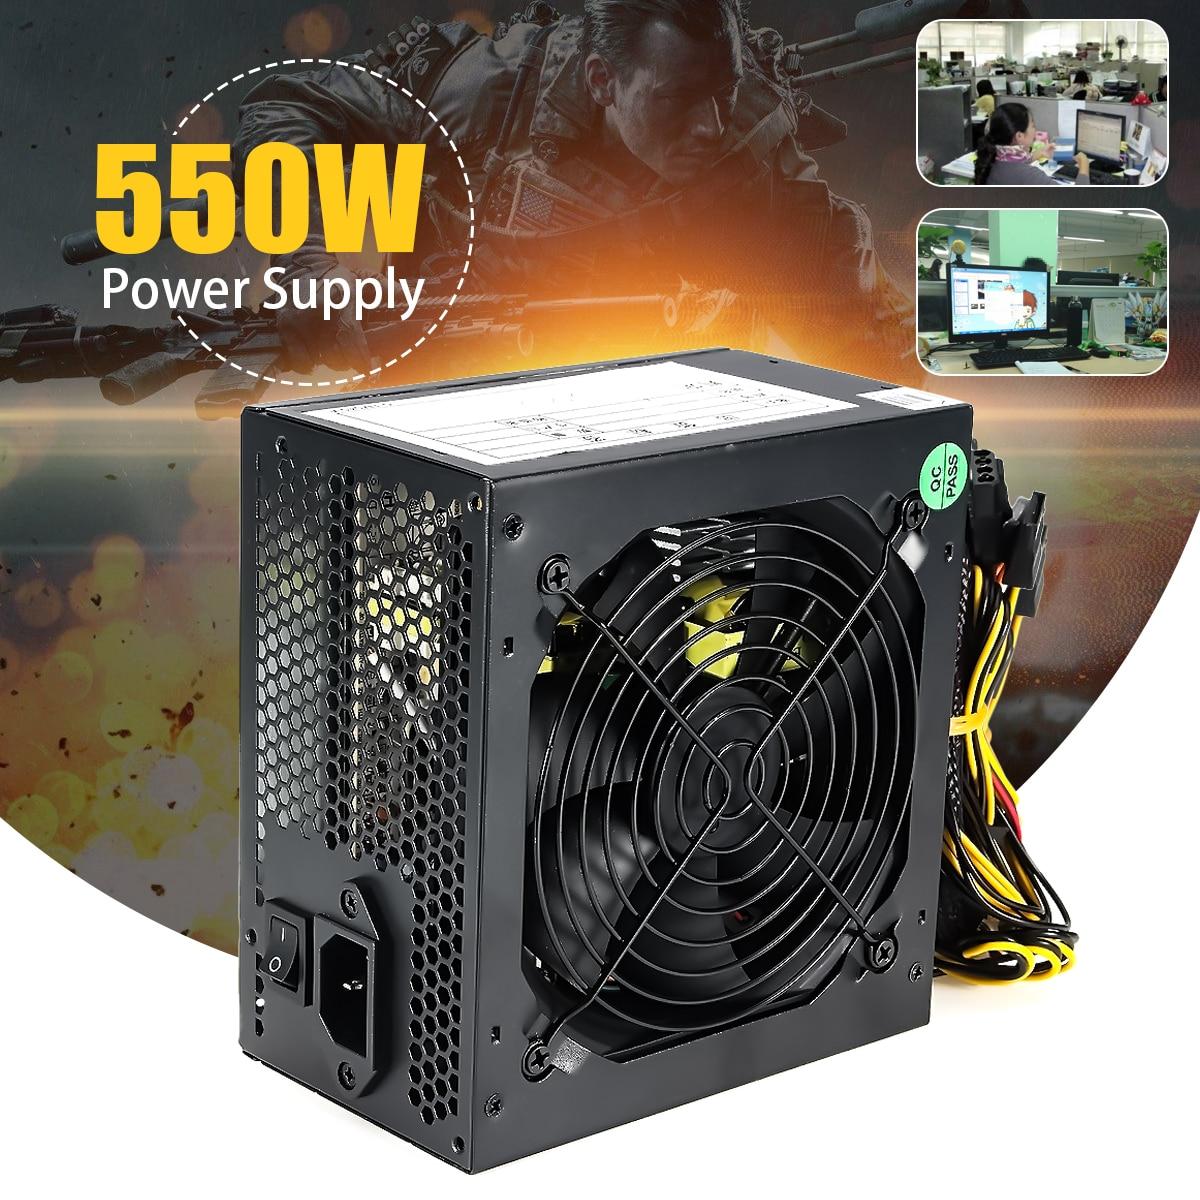 400W 550W Peak- PC PSU Power Supply Black Gaming 120mm Fan Blue LED 20/24pin 12V ATX High Quality Computer Power Supply For BTC